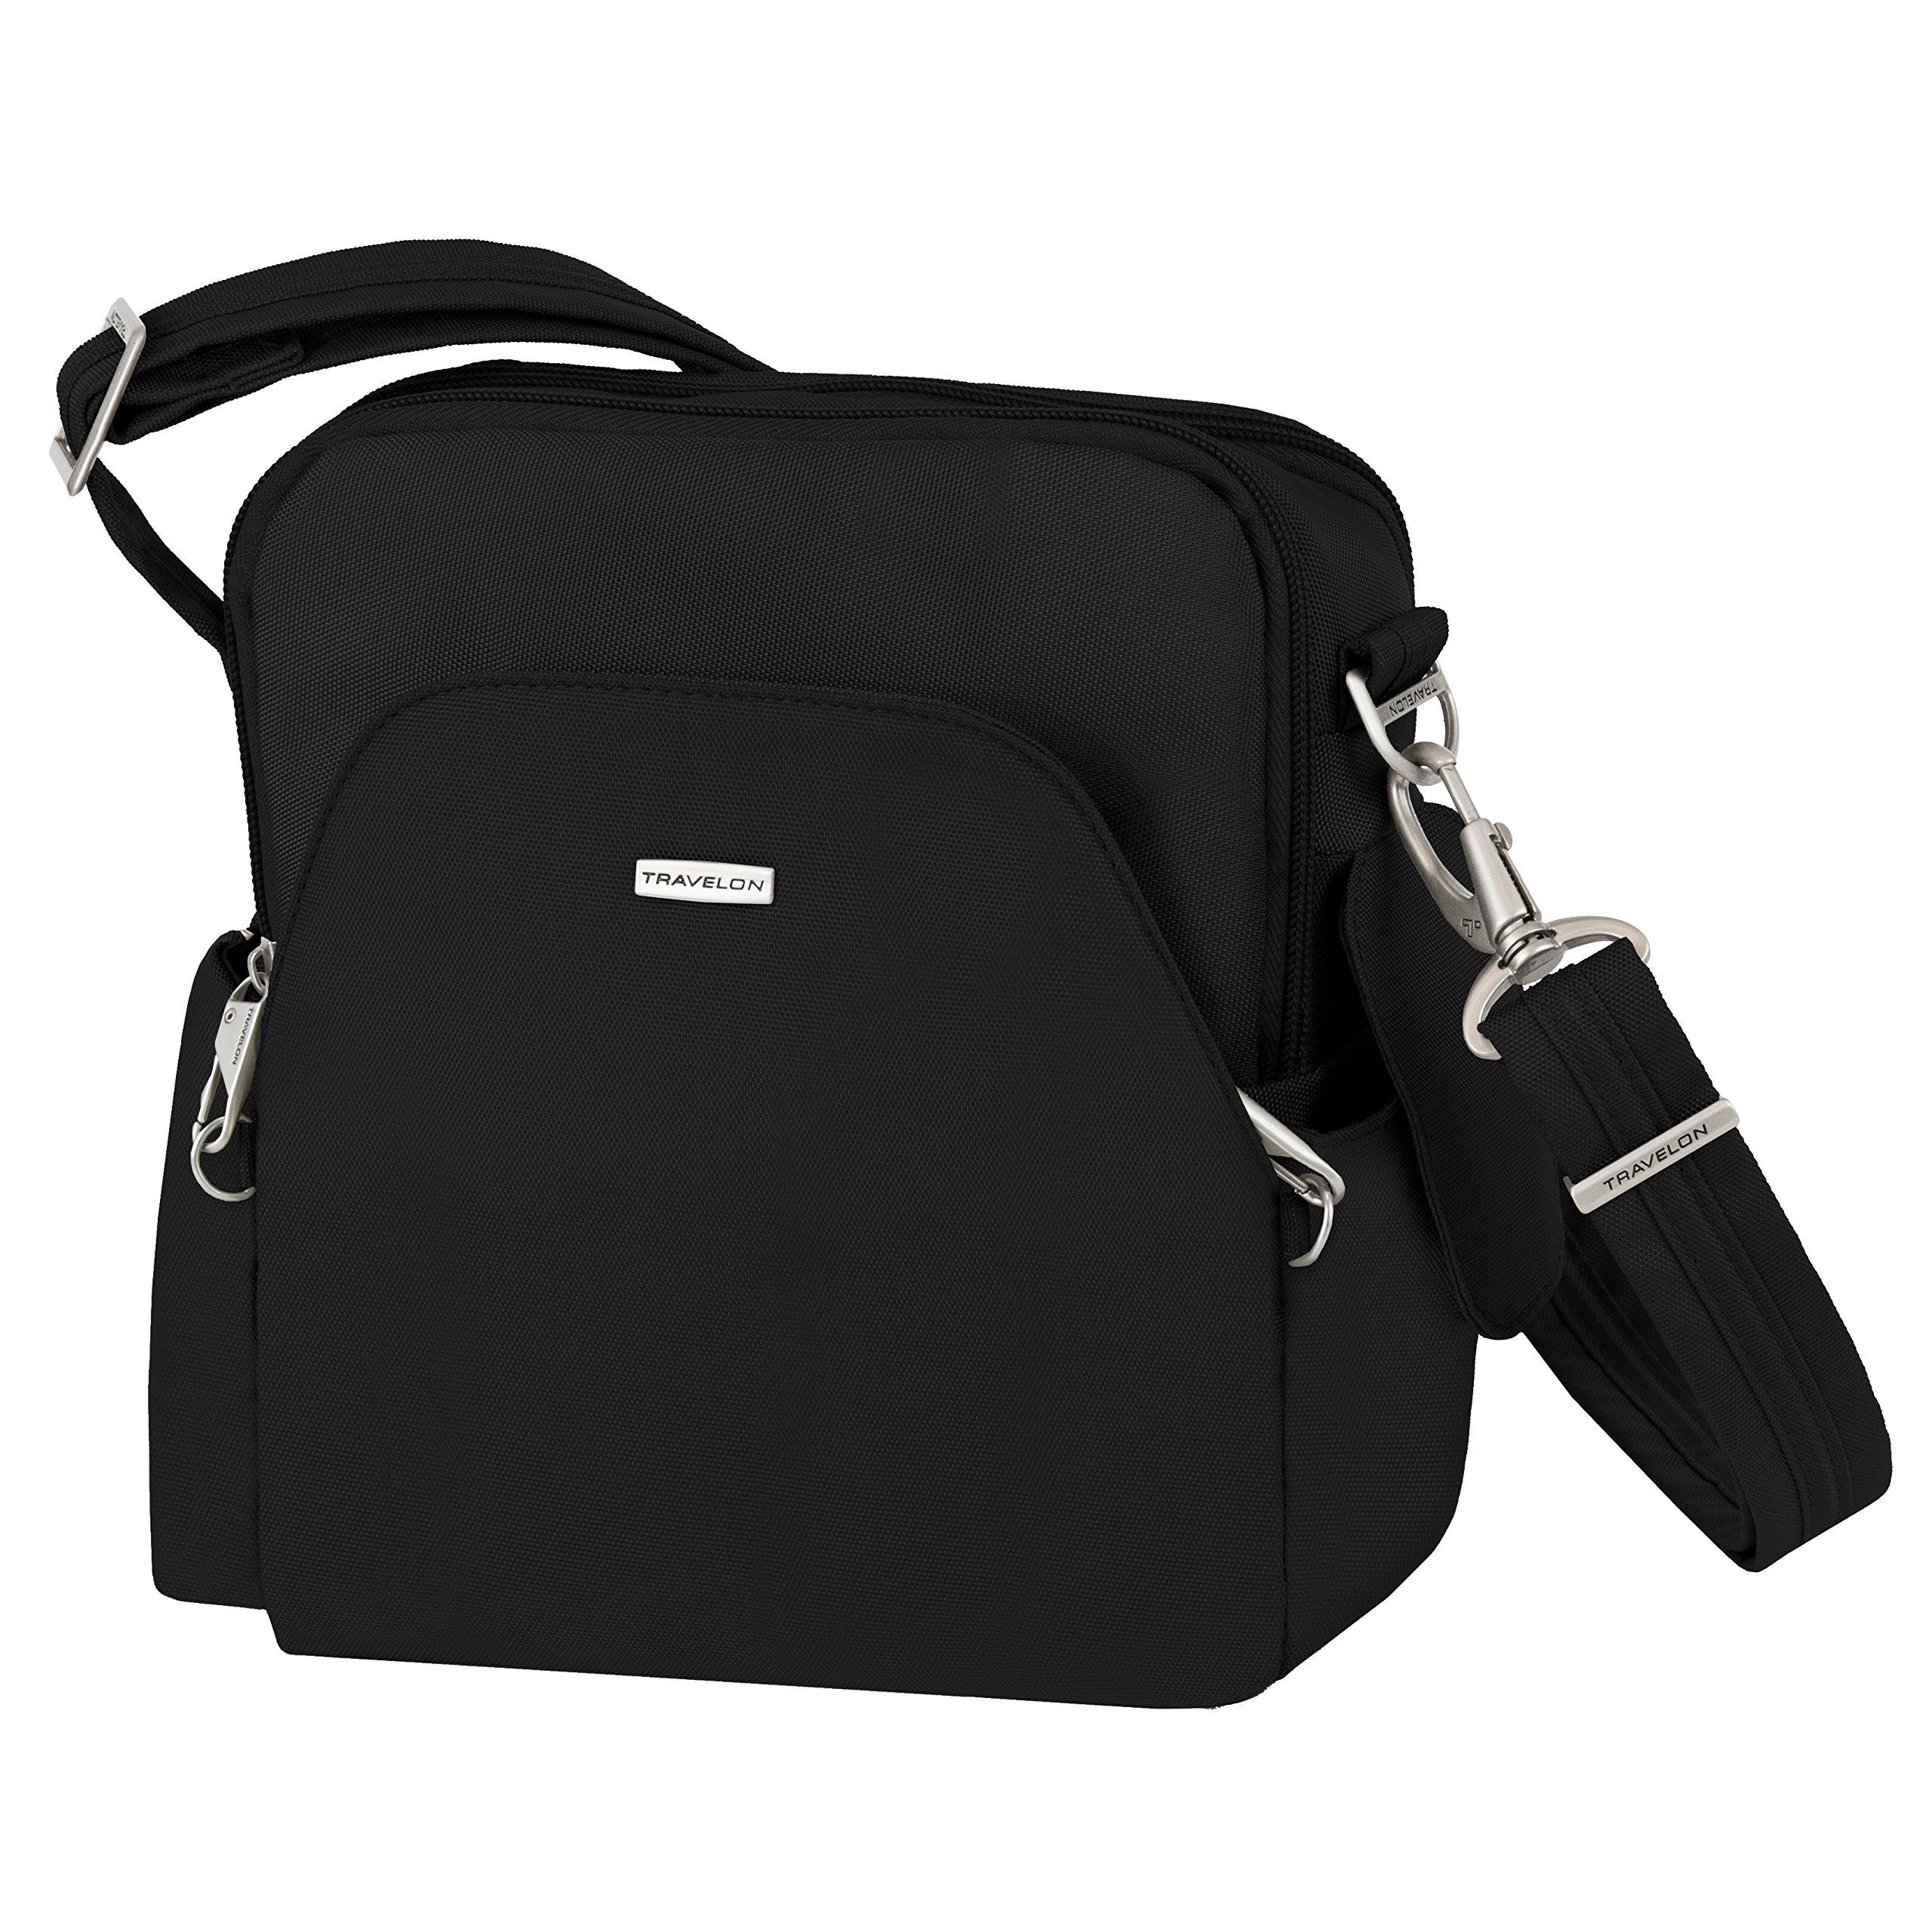 Travelon Anti-Theft Travel Bag, Black, One Size